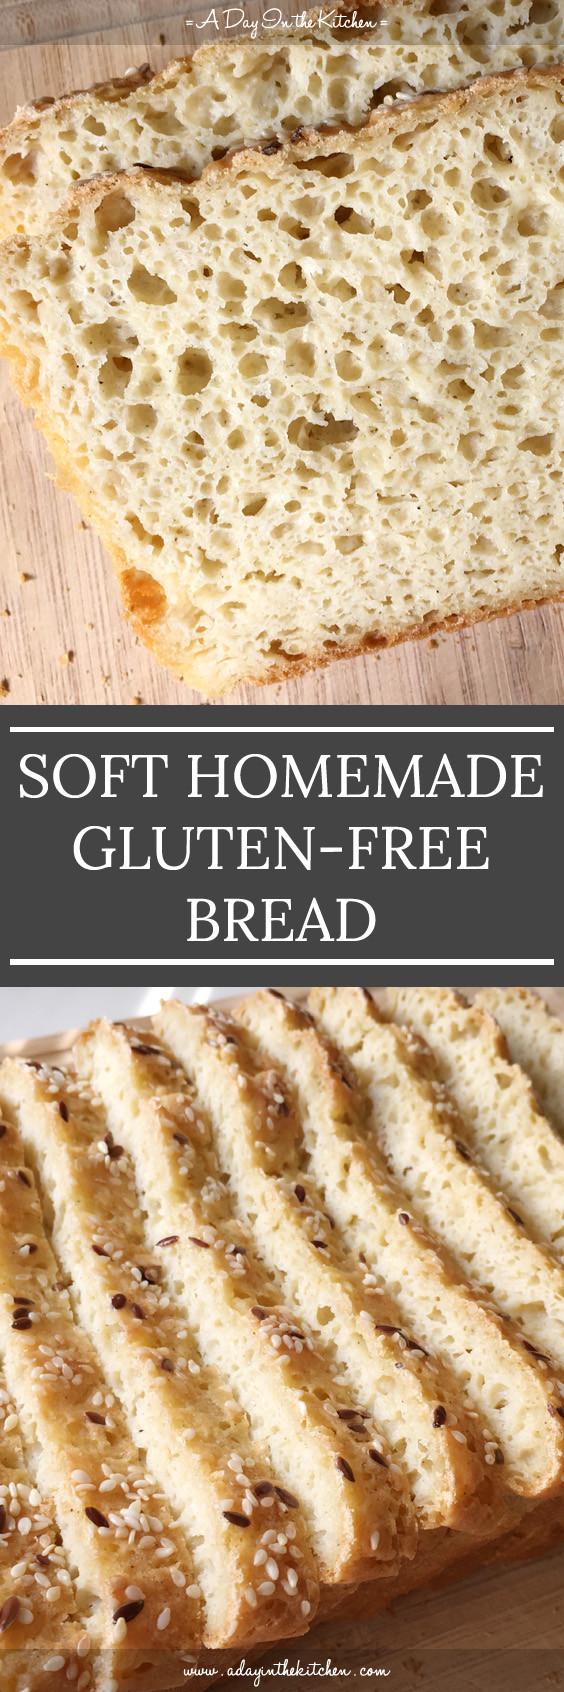 Diy Gluten Free Bread  Soft Homemade Gluten Free Bread